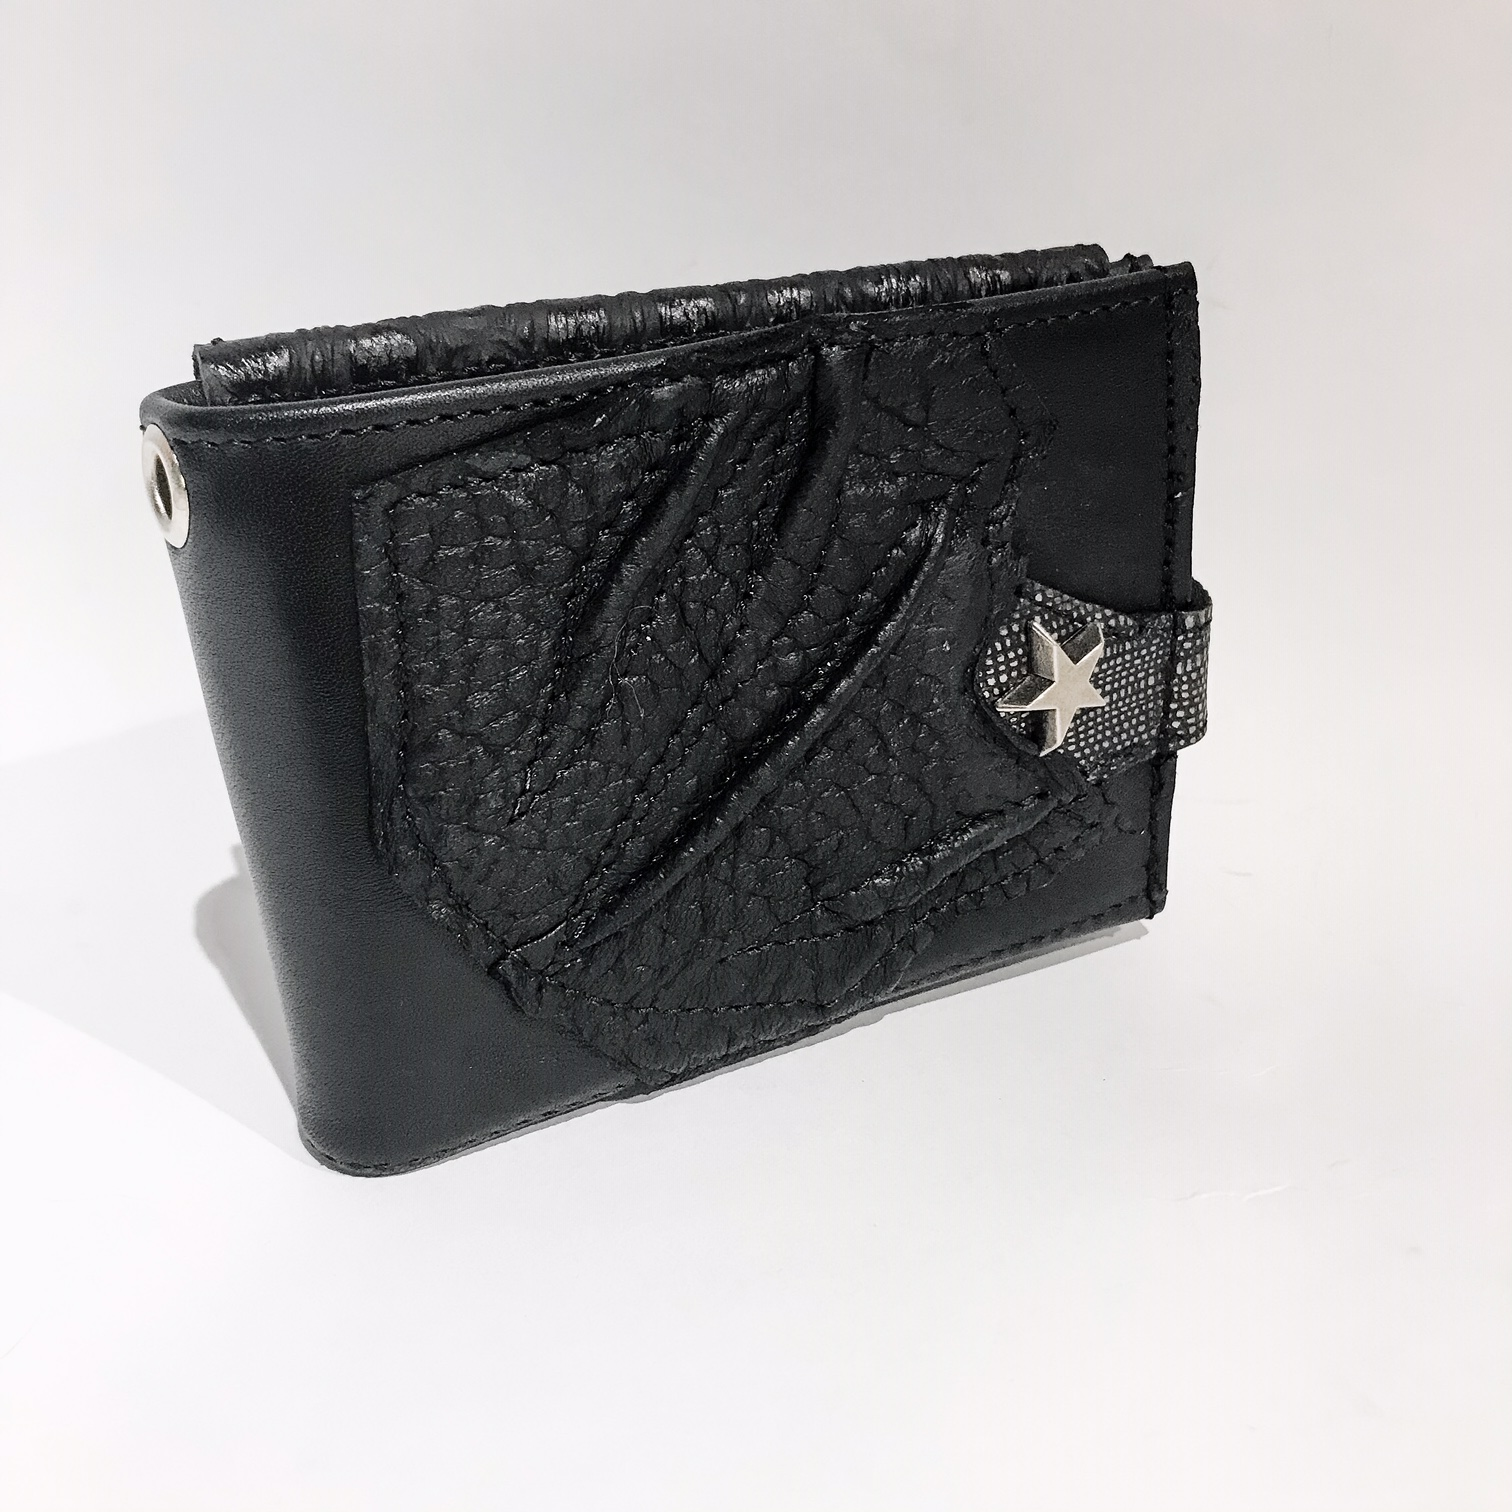 Blackstar Silverish Leather Wallet EvilEve